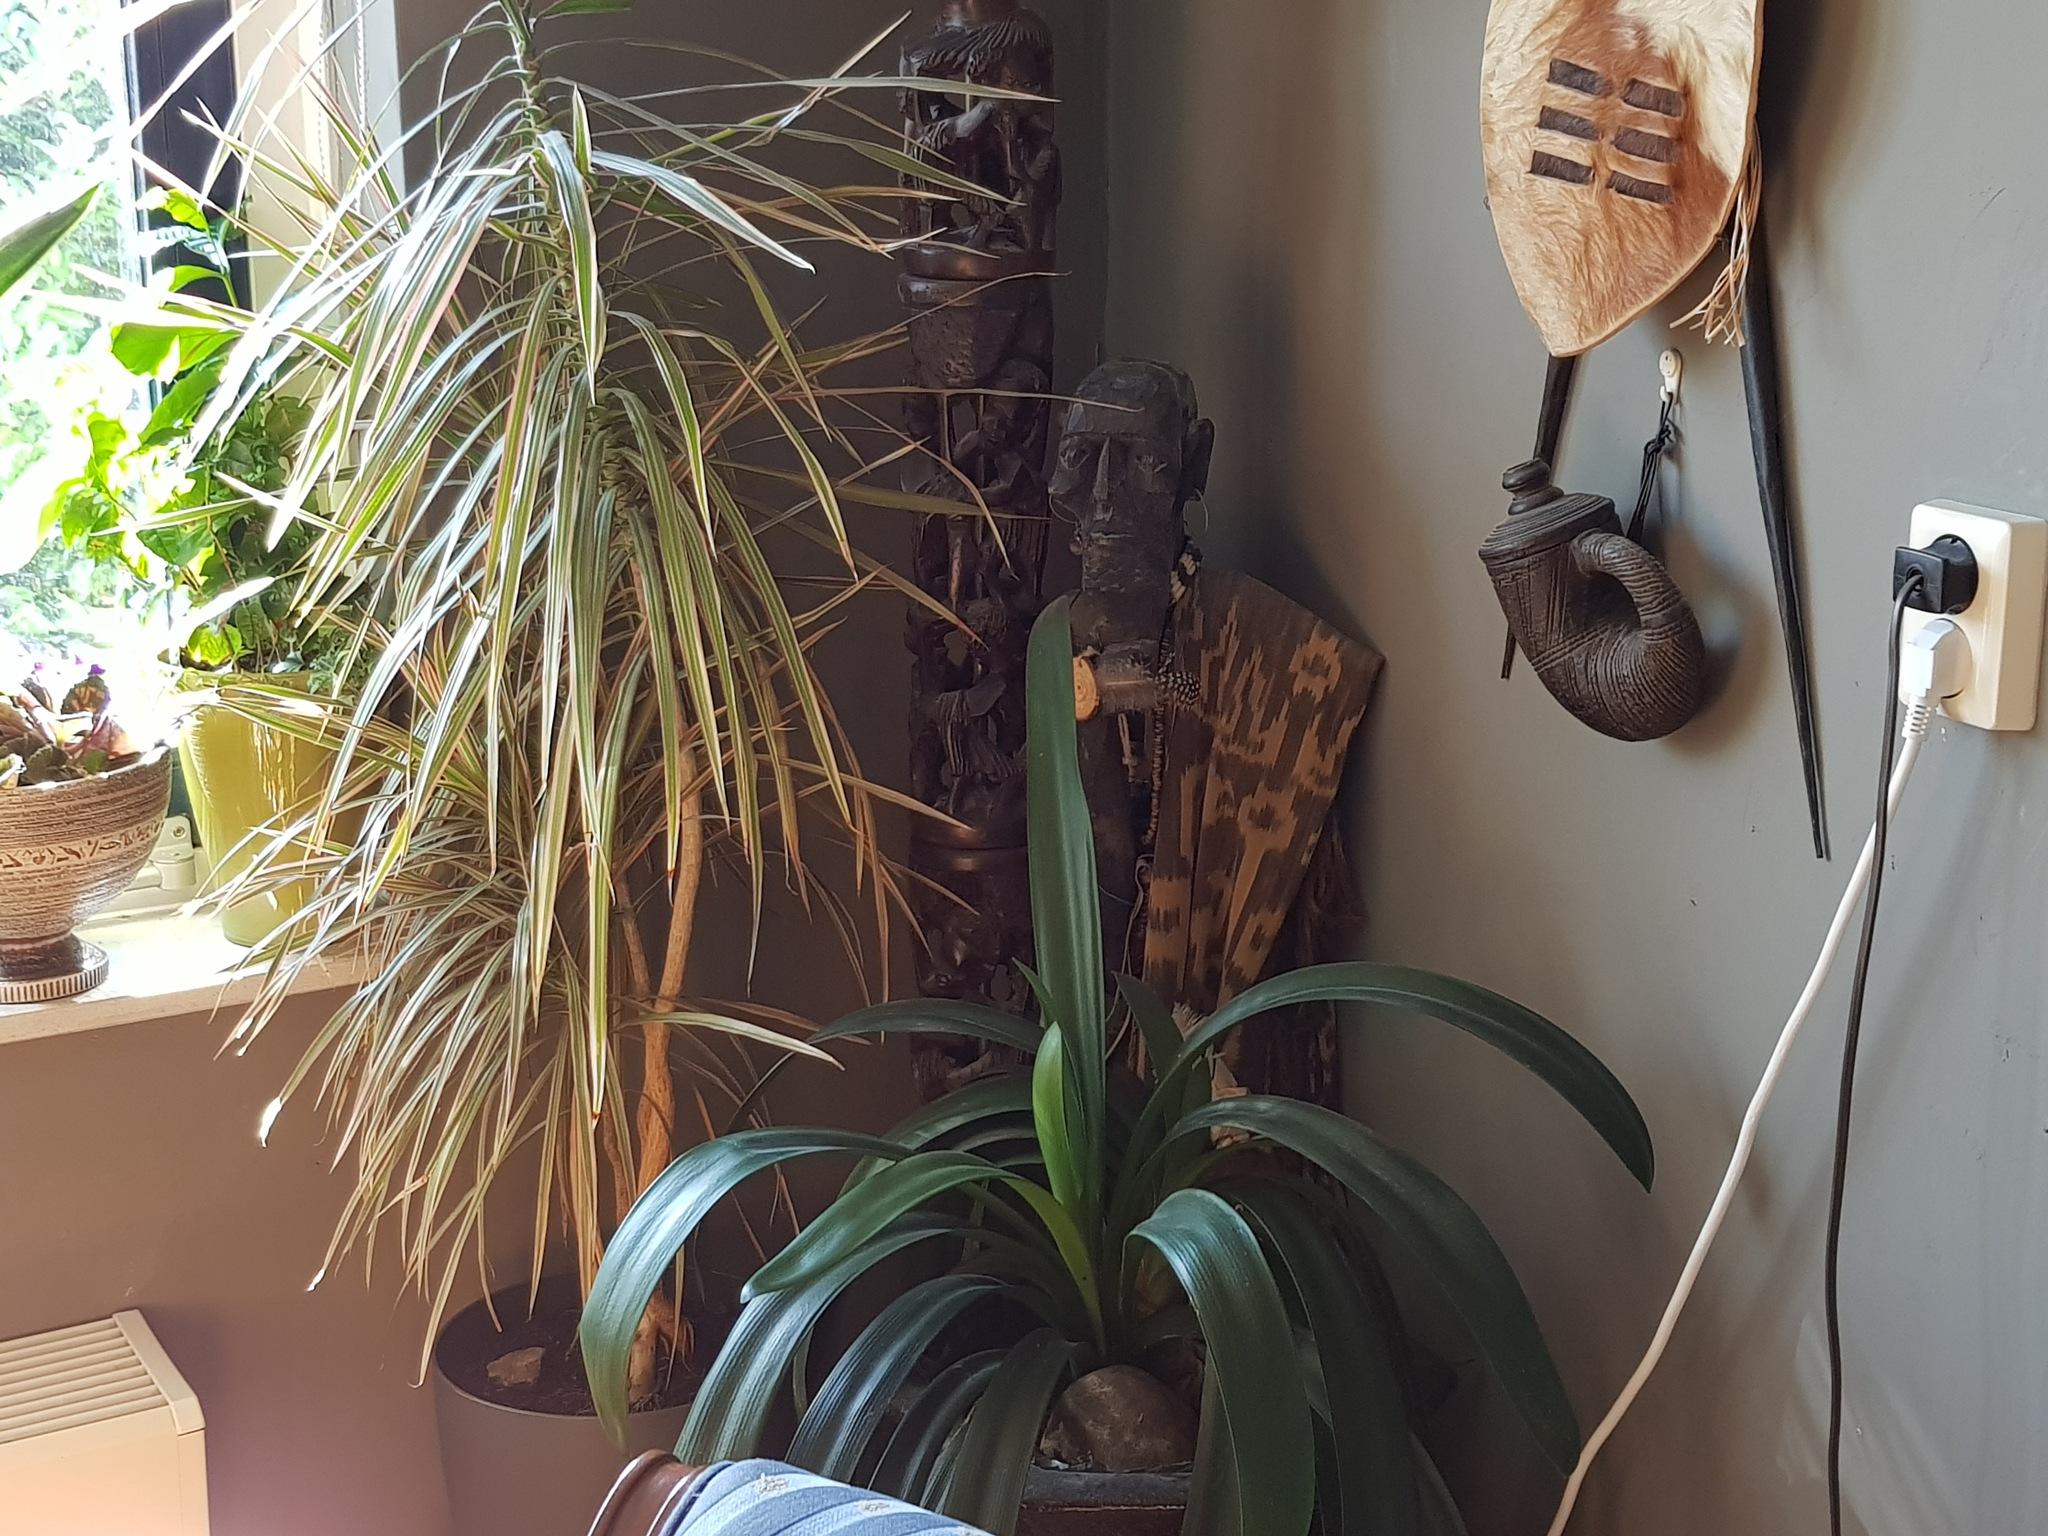 grandpa watch my plants by Justmetoo